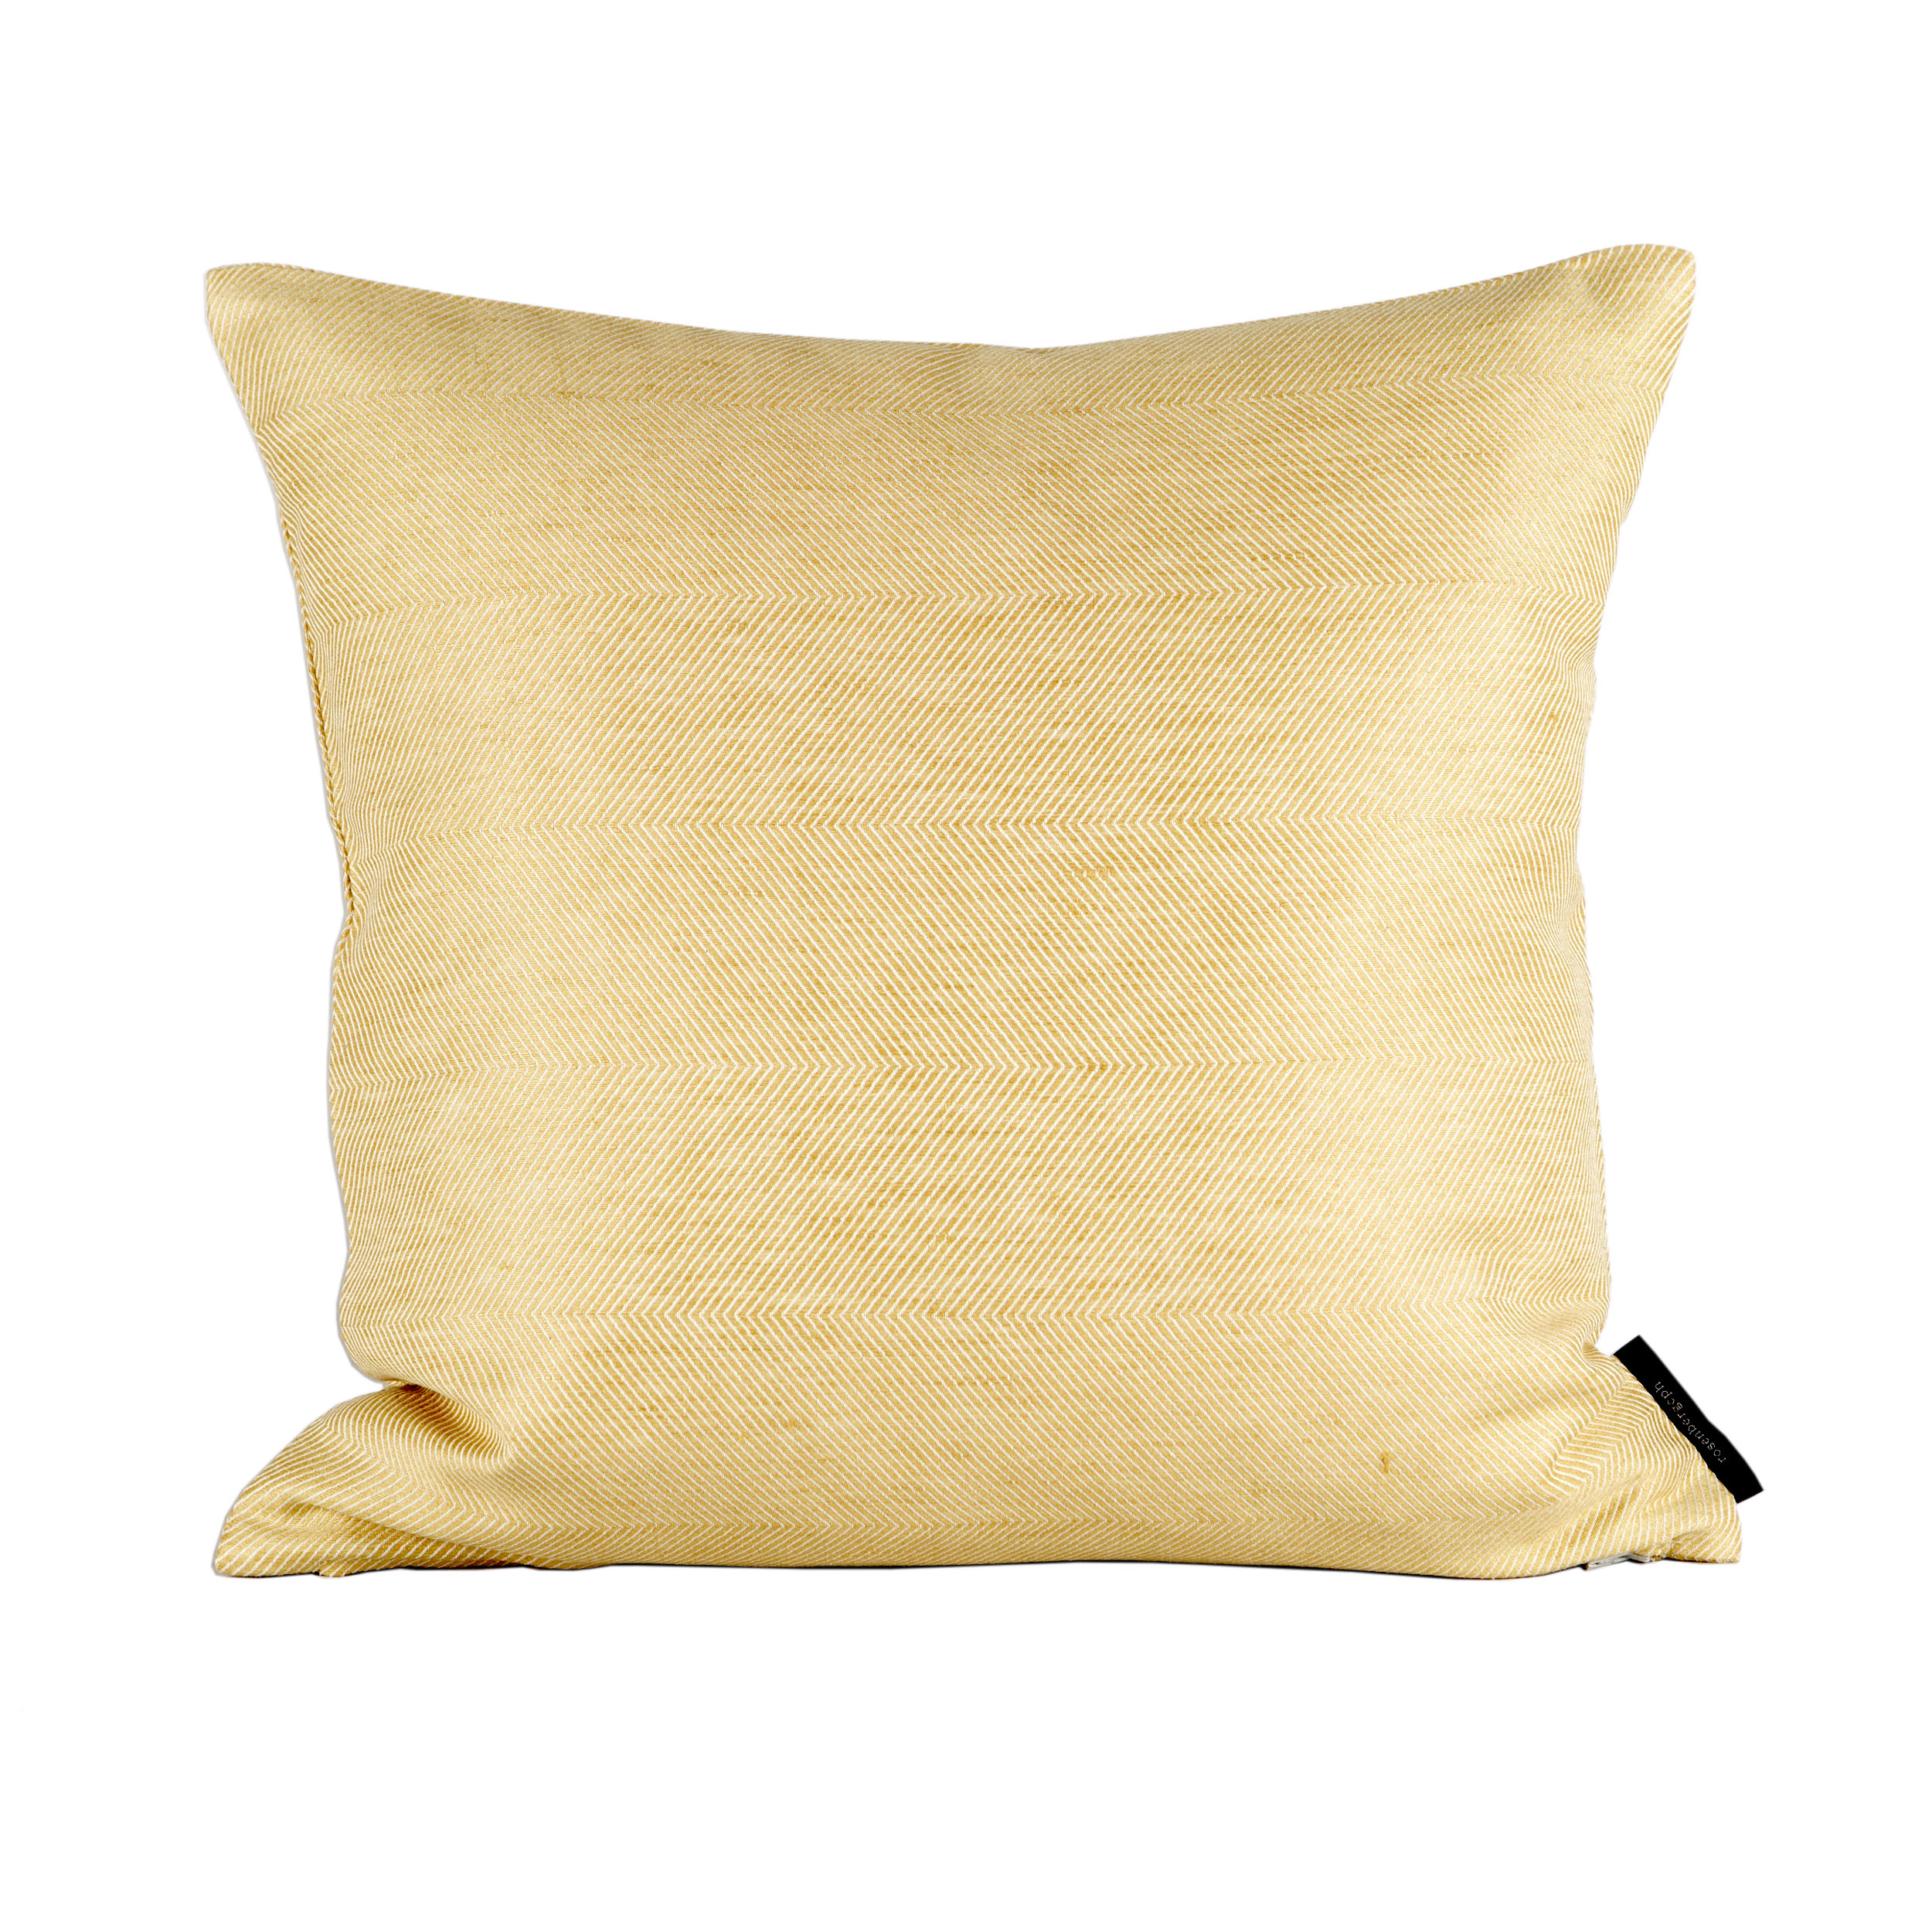 Square cushion linen/cotton hay yellow design by Anne Rosenberg, RosenbergCph